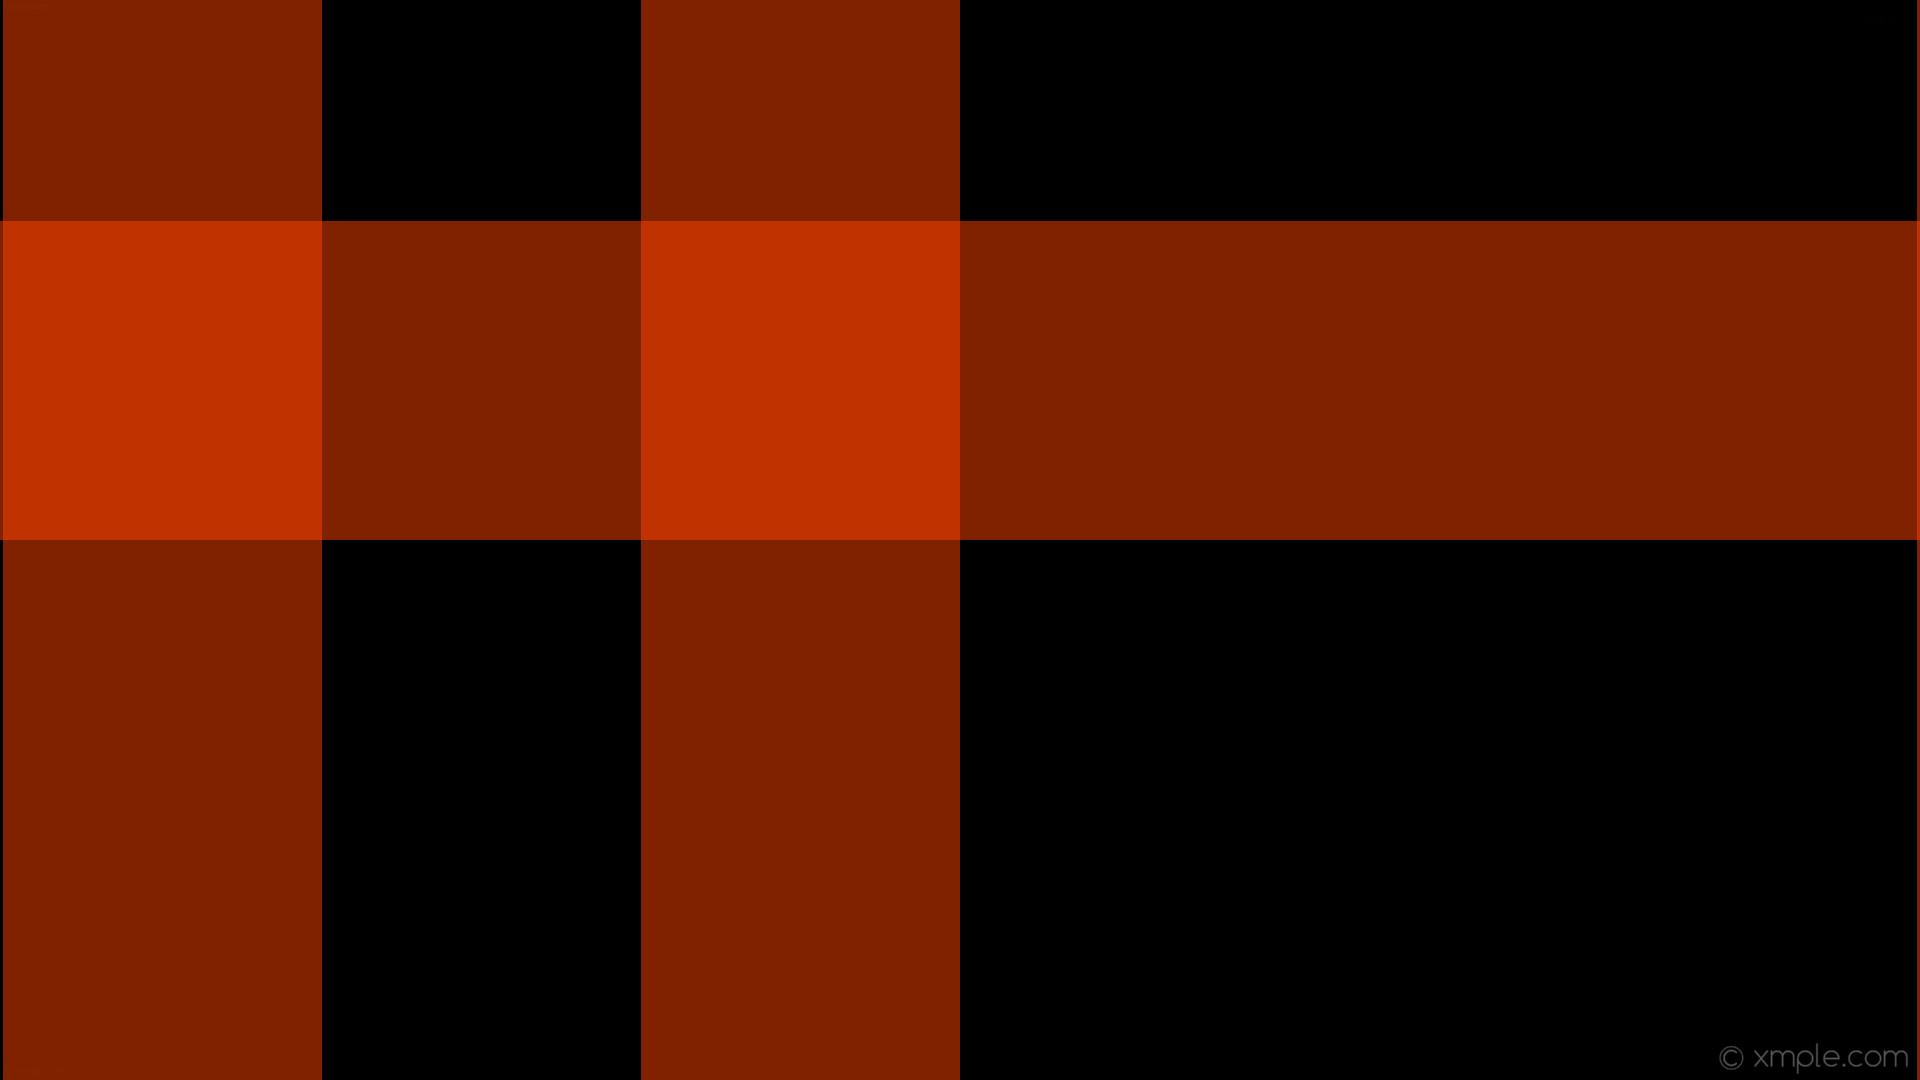 wallpaper dual black striped gingham orange orangered #000000 #ff4500 180°  319px